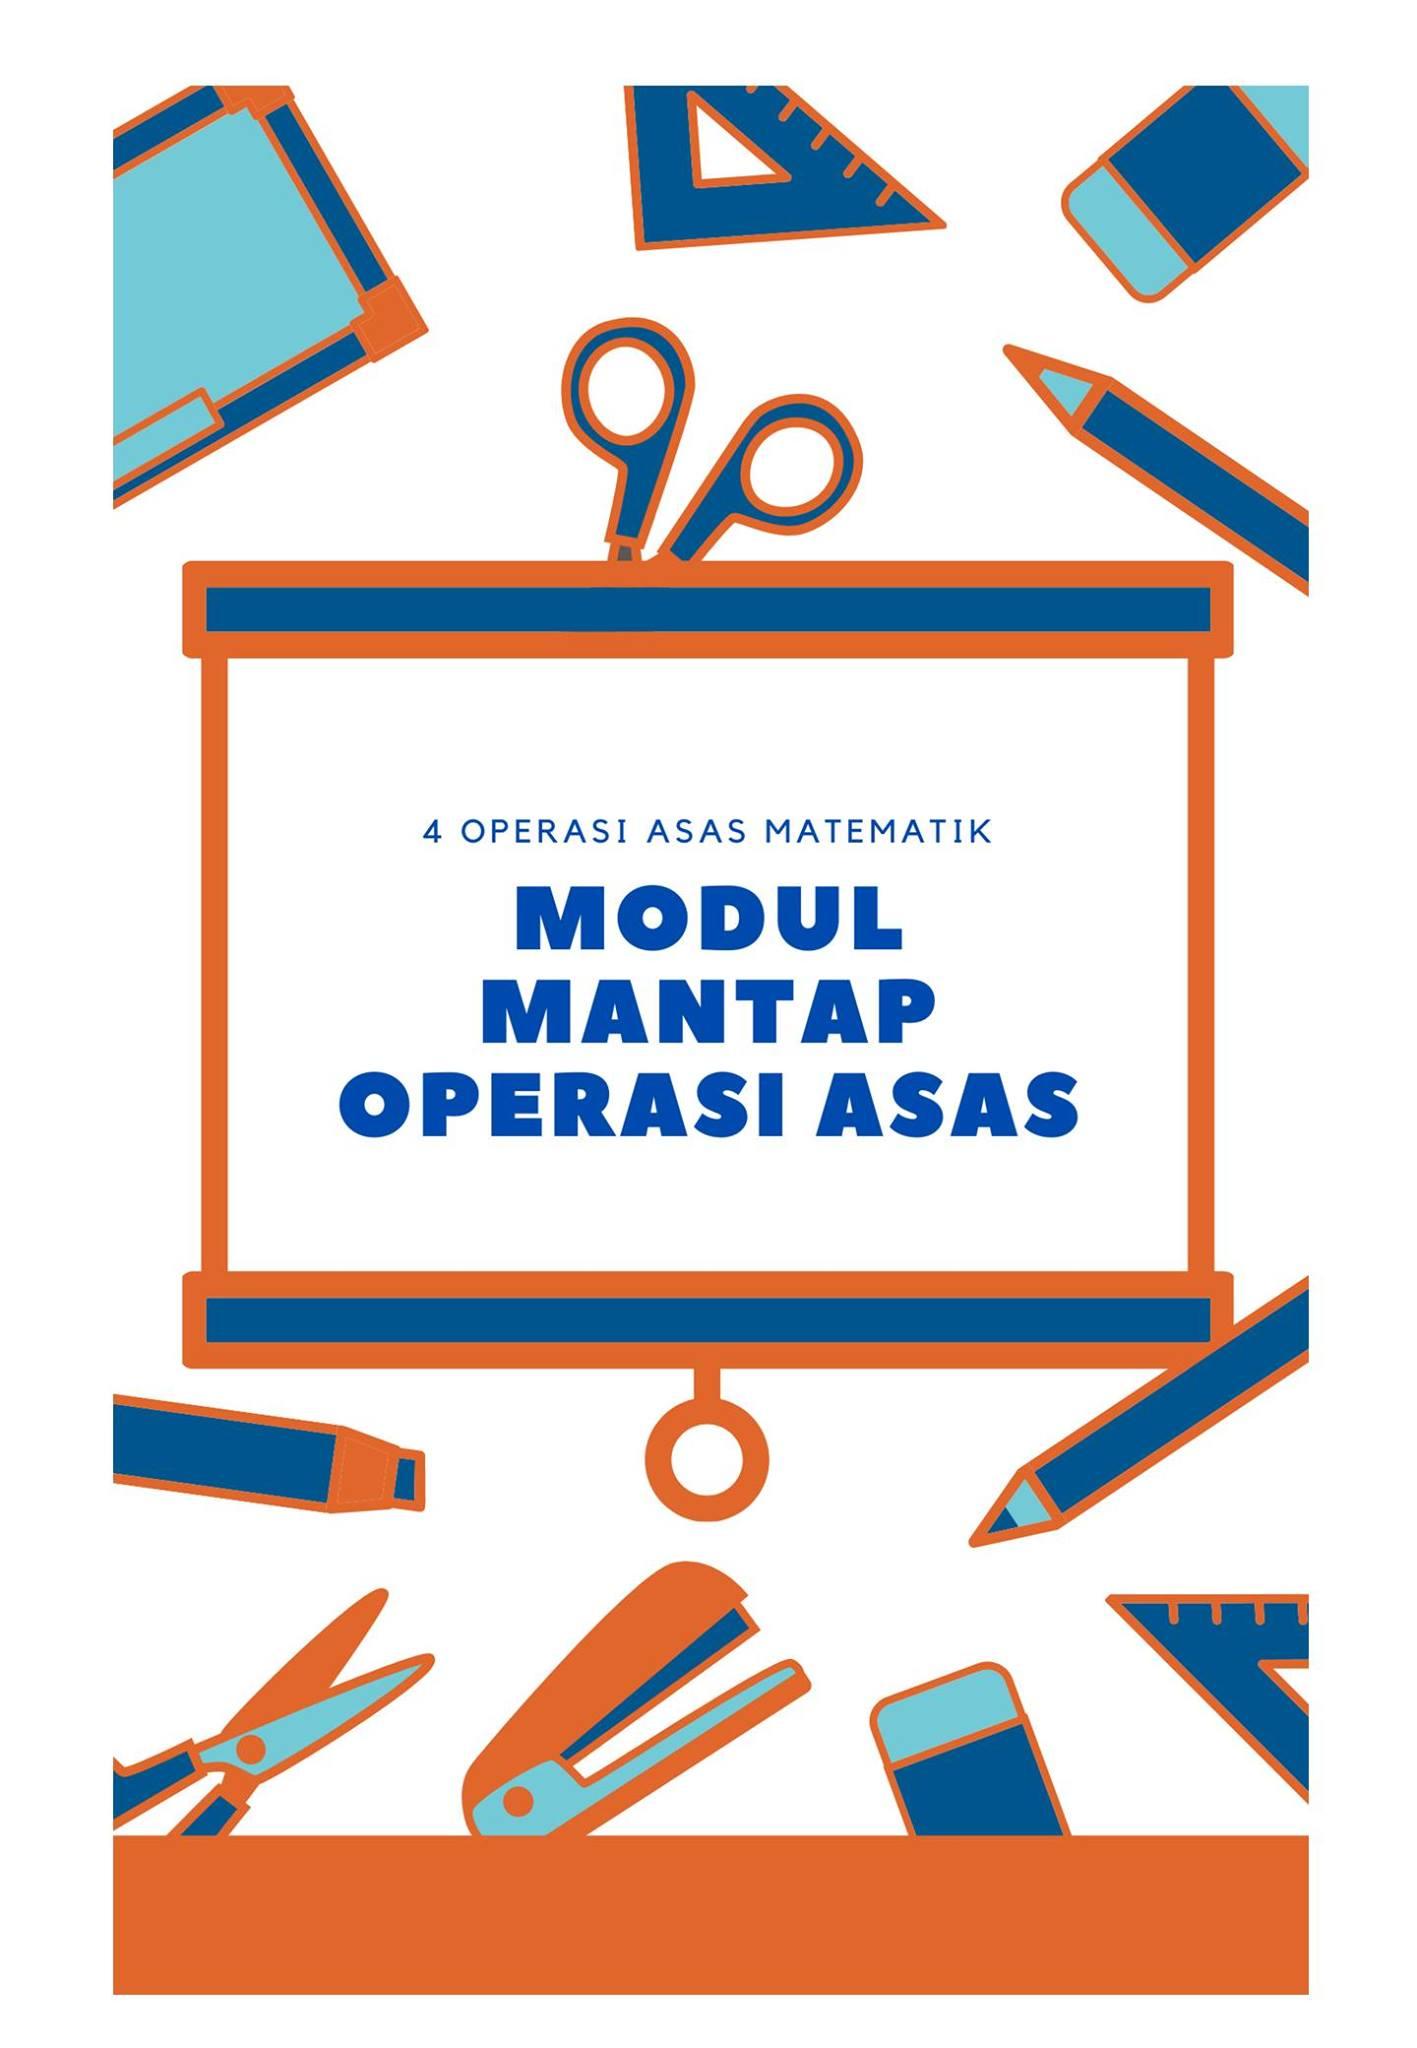 modul-mantap-operasi-asas-matematik-1